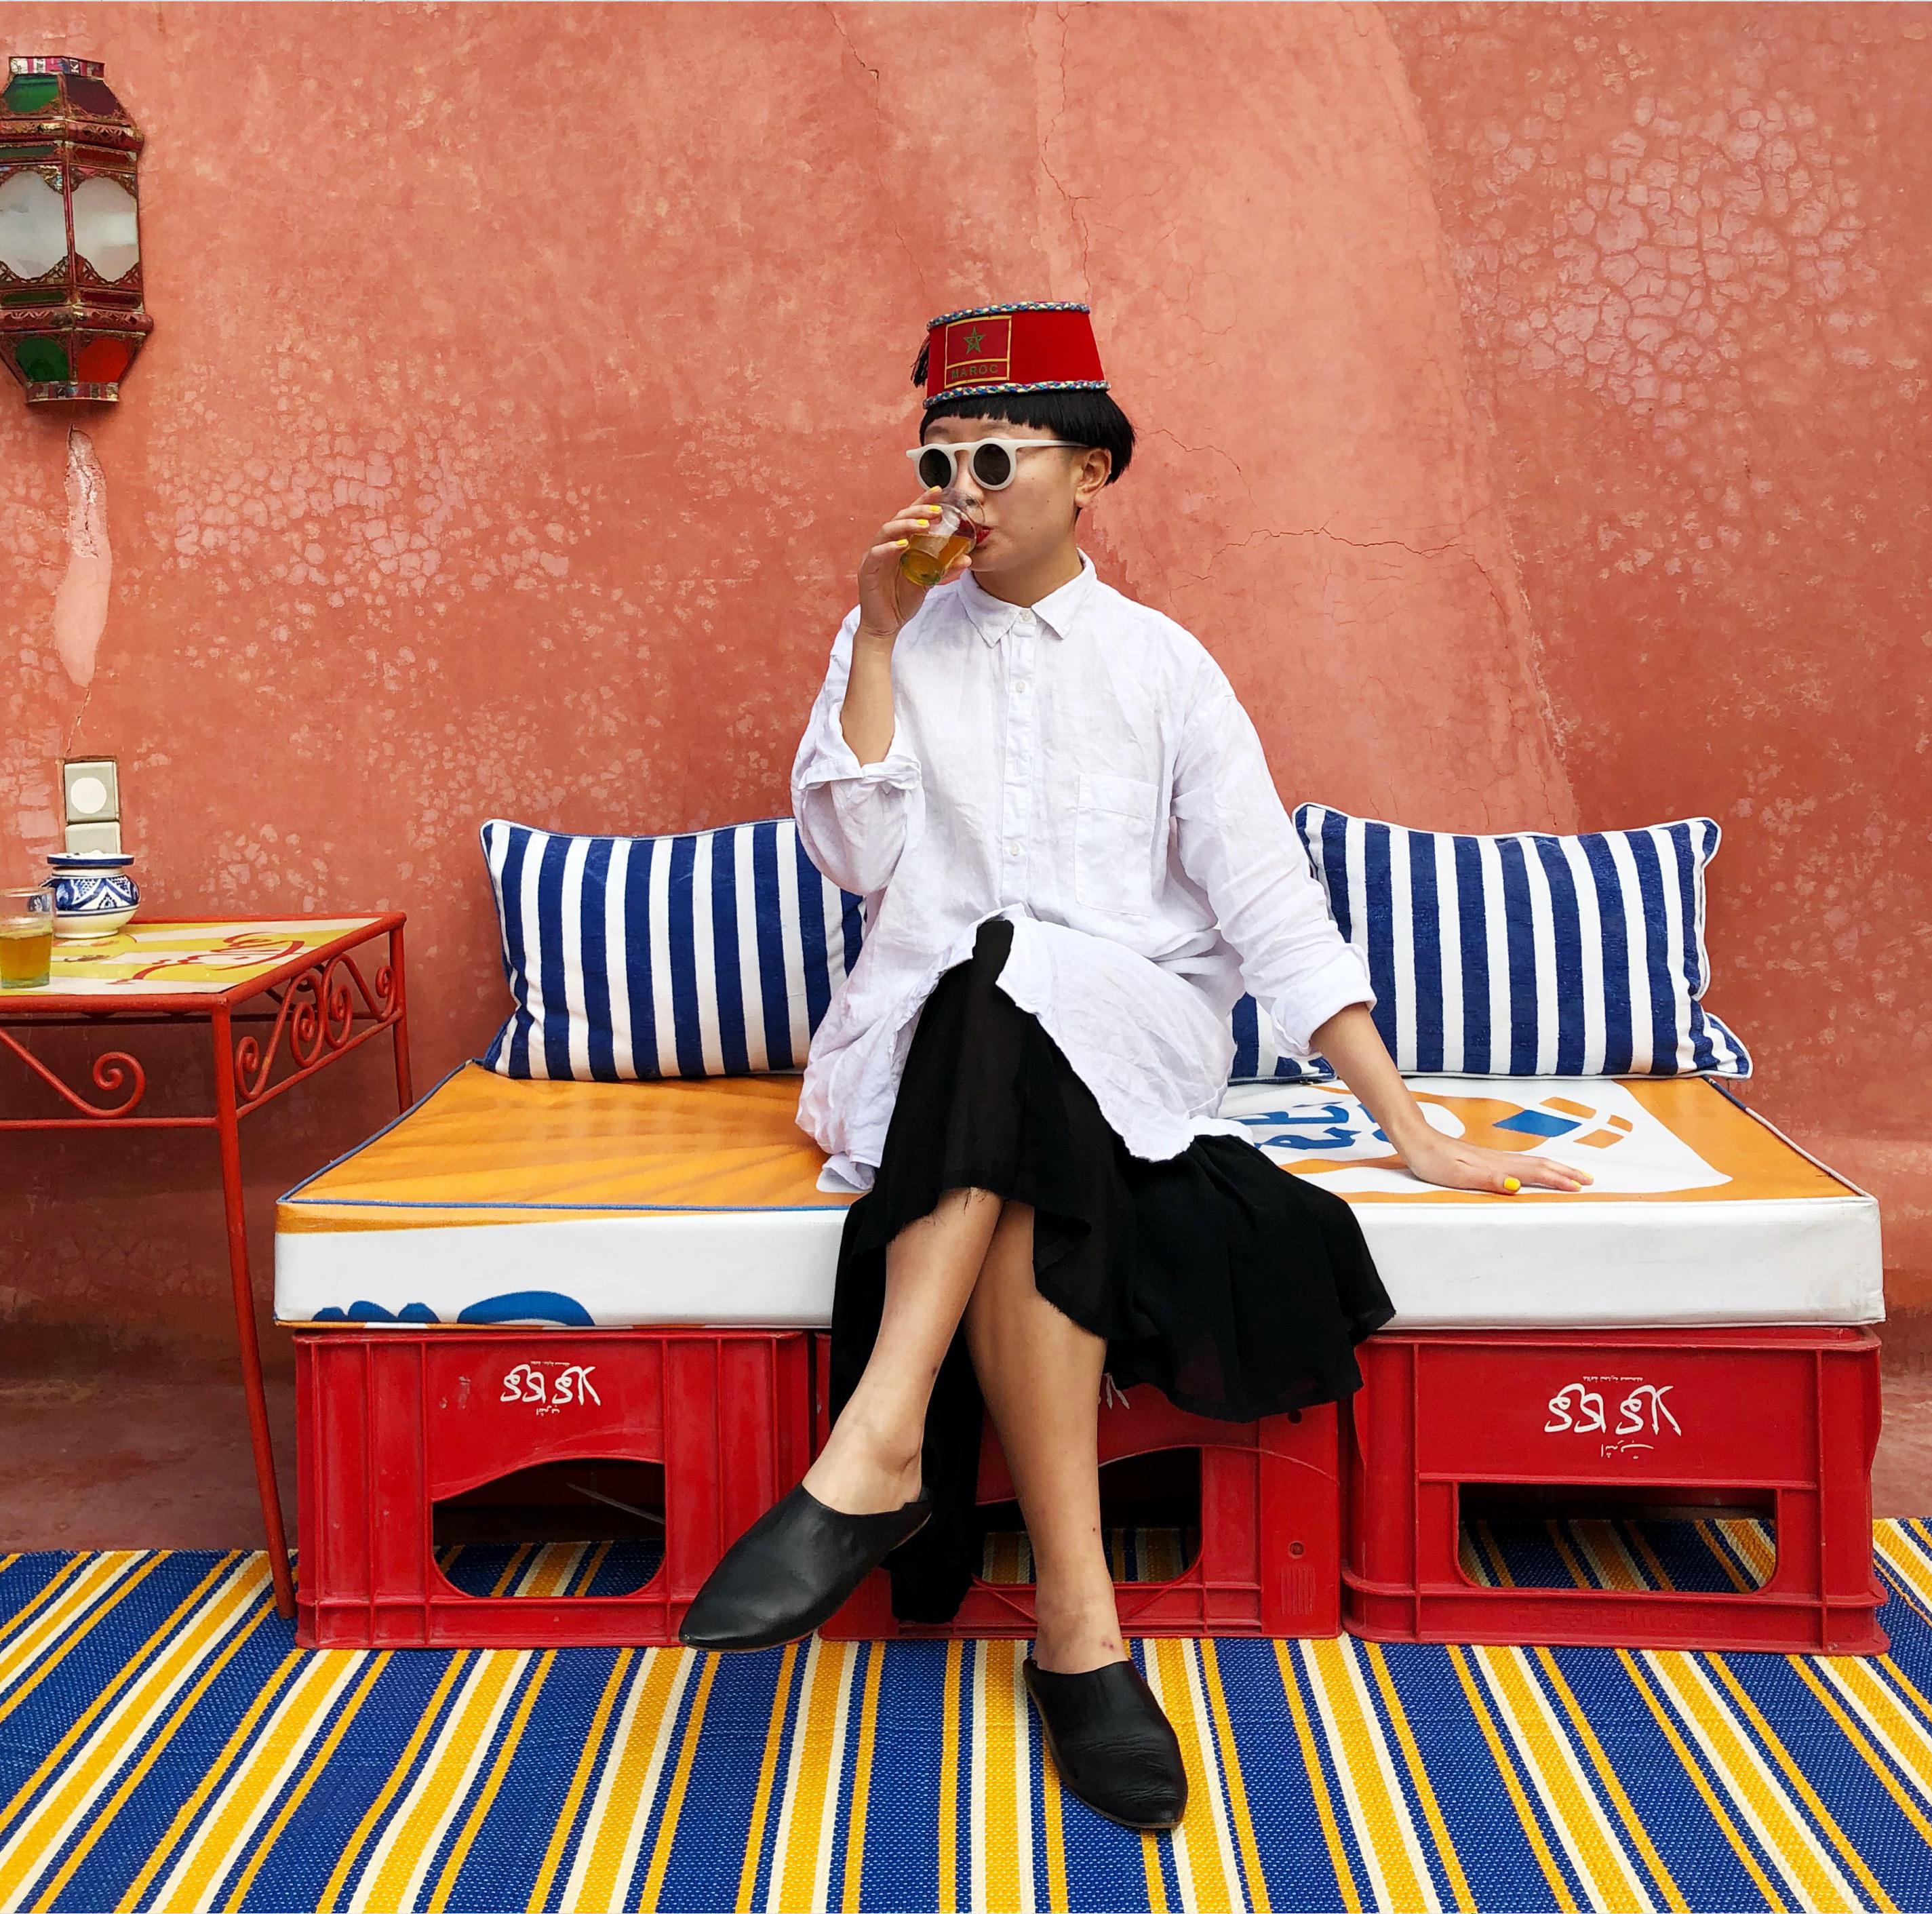 JiaJia Fei at artist Hassan Hajjaj's Studio Riad Yima in Marrakech, Morocco, for the 1-54 Art Fair 2018